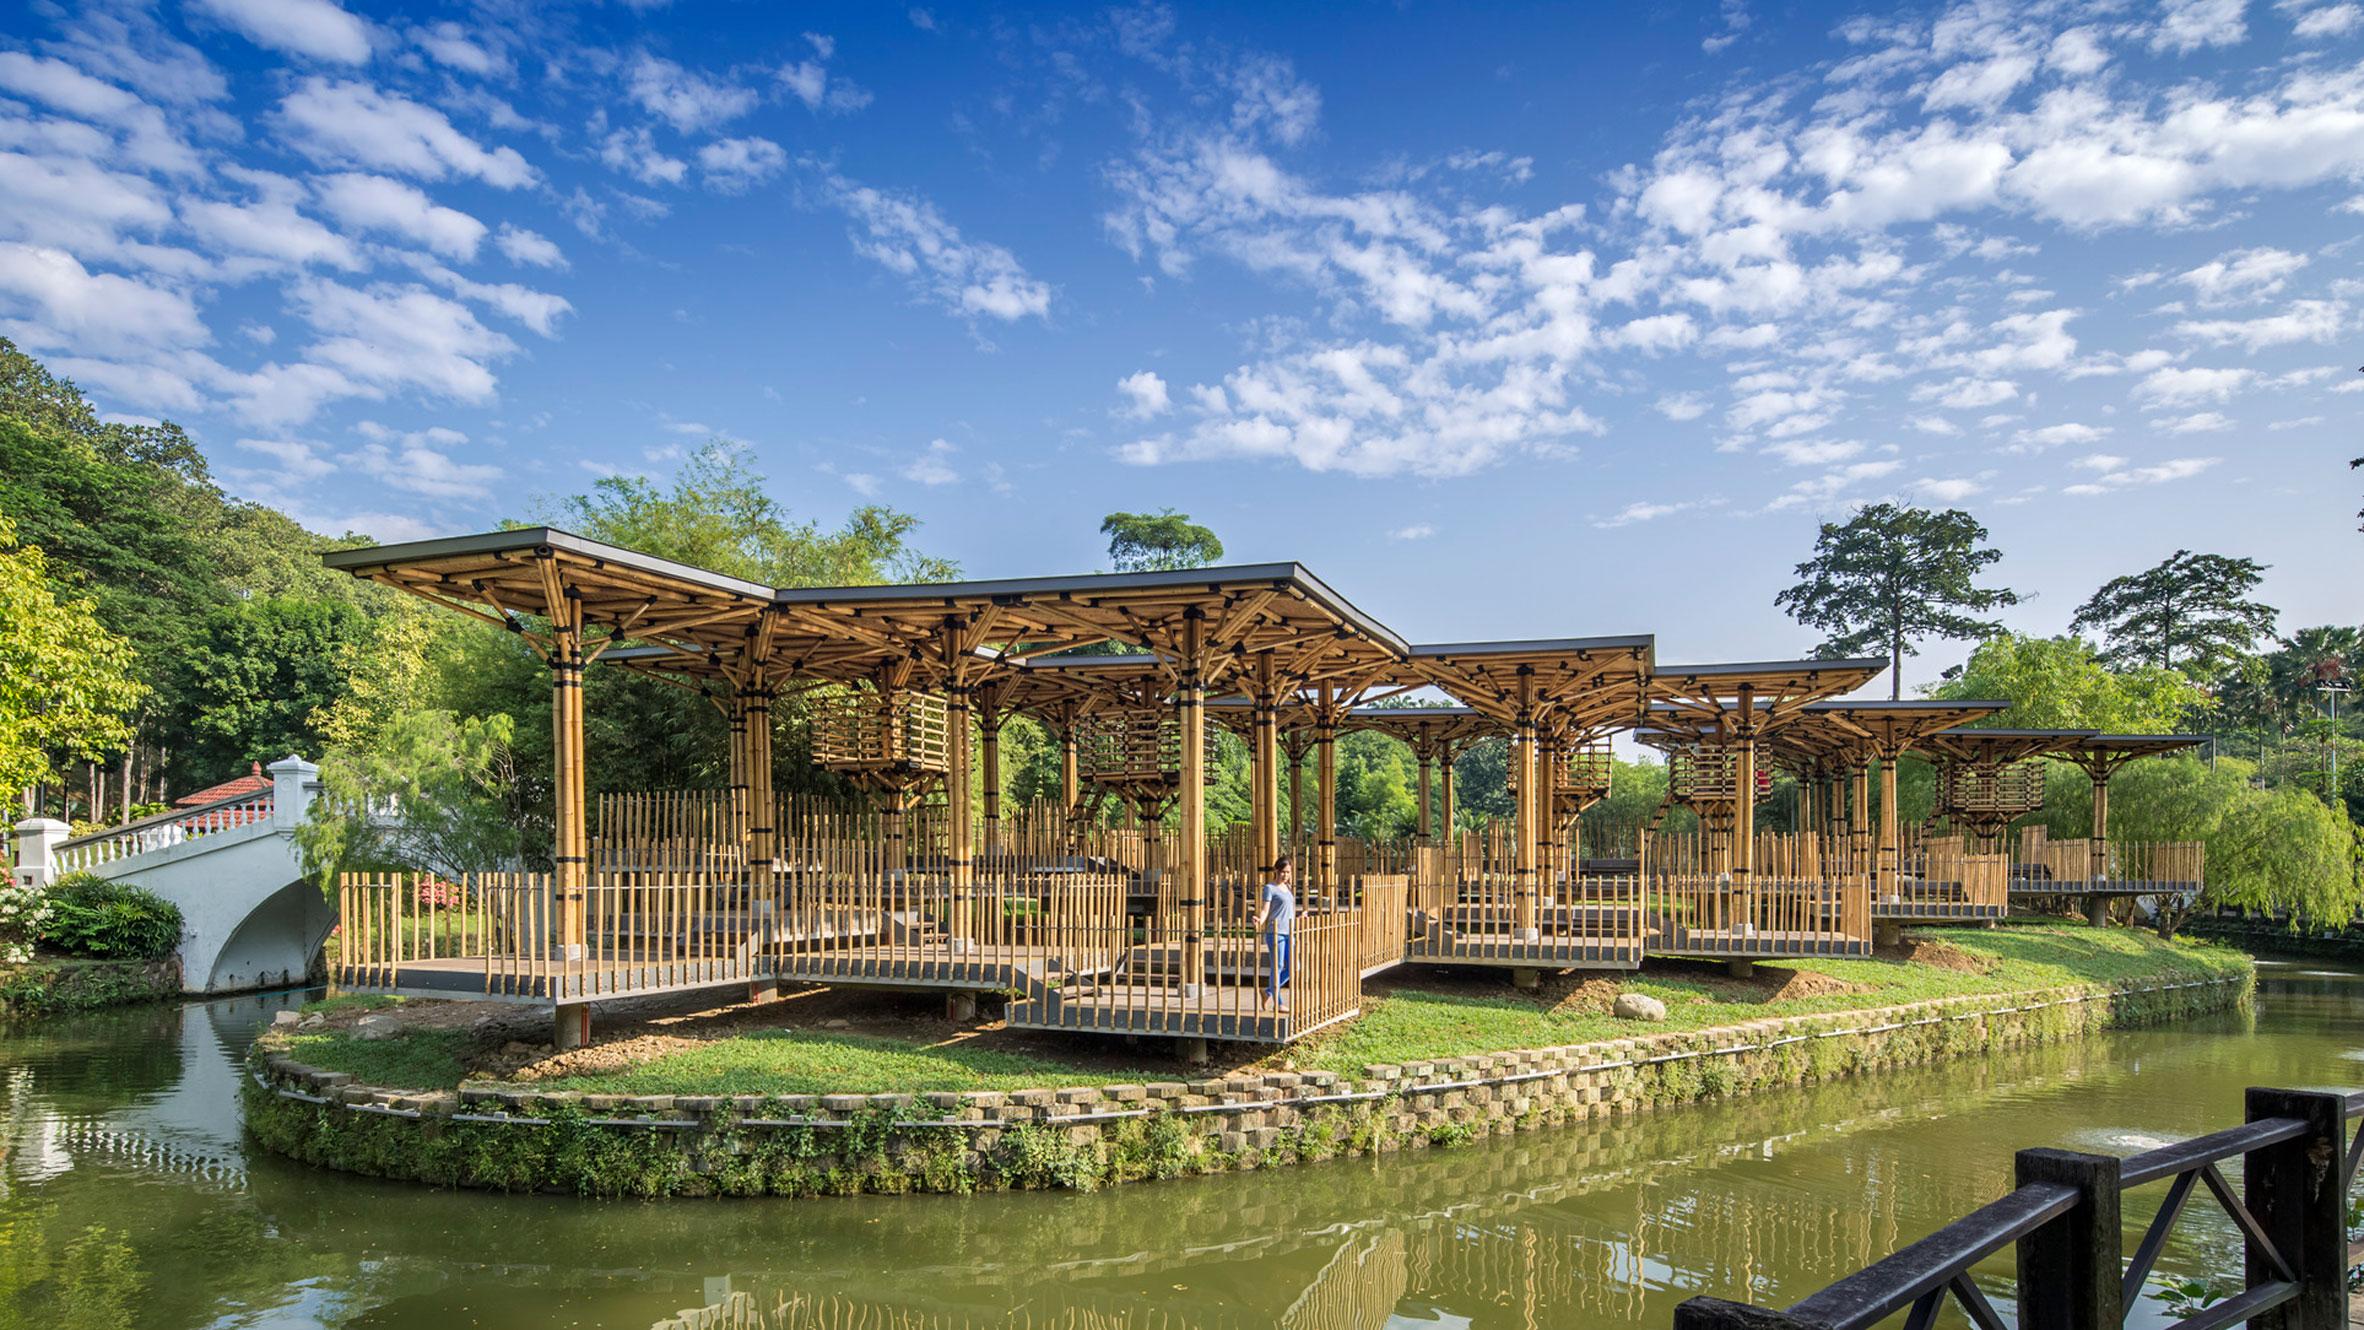 The Bamboo Playhouse by Eleena Jamil Architect